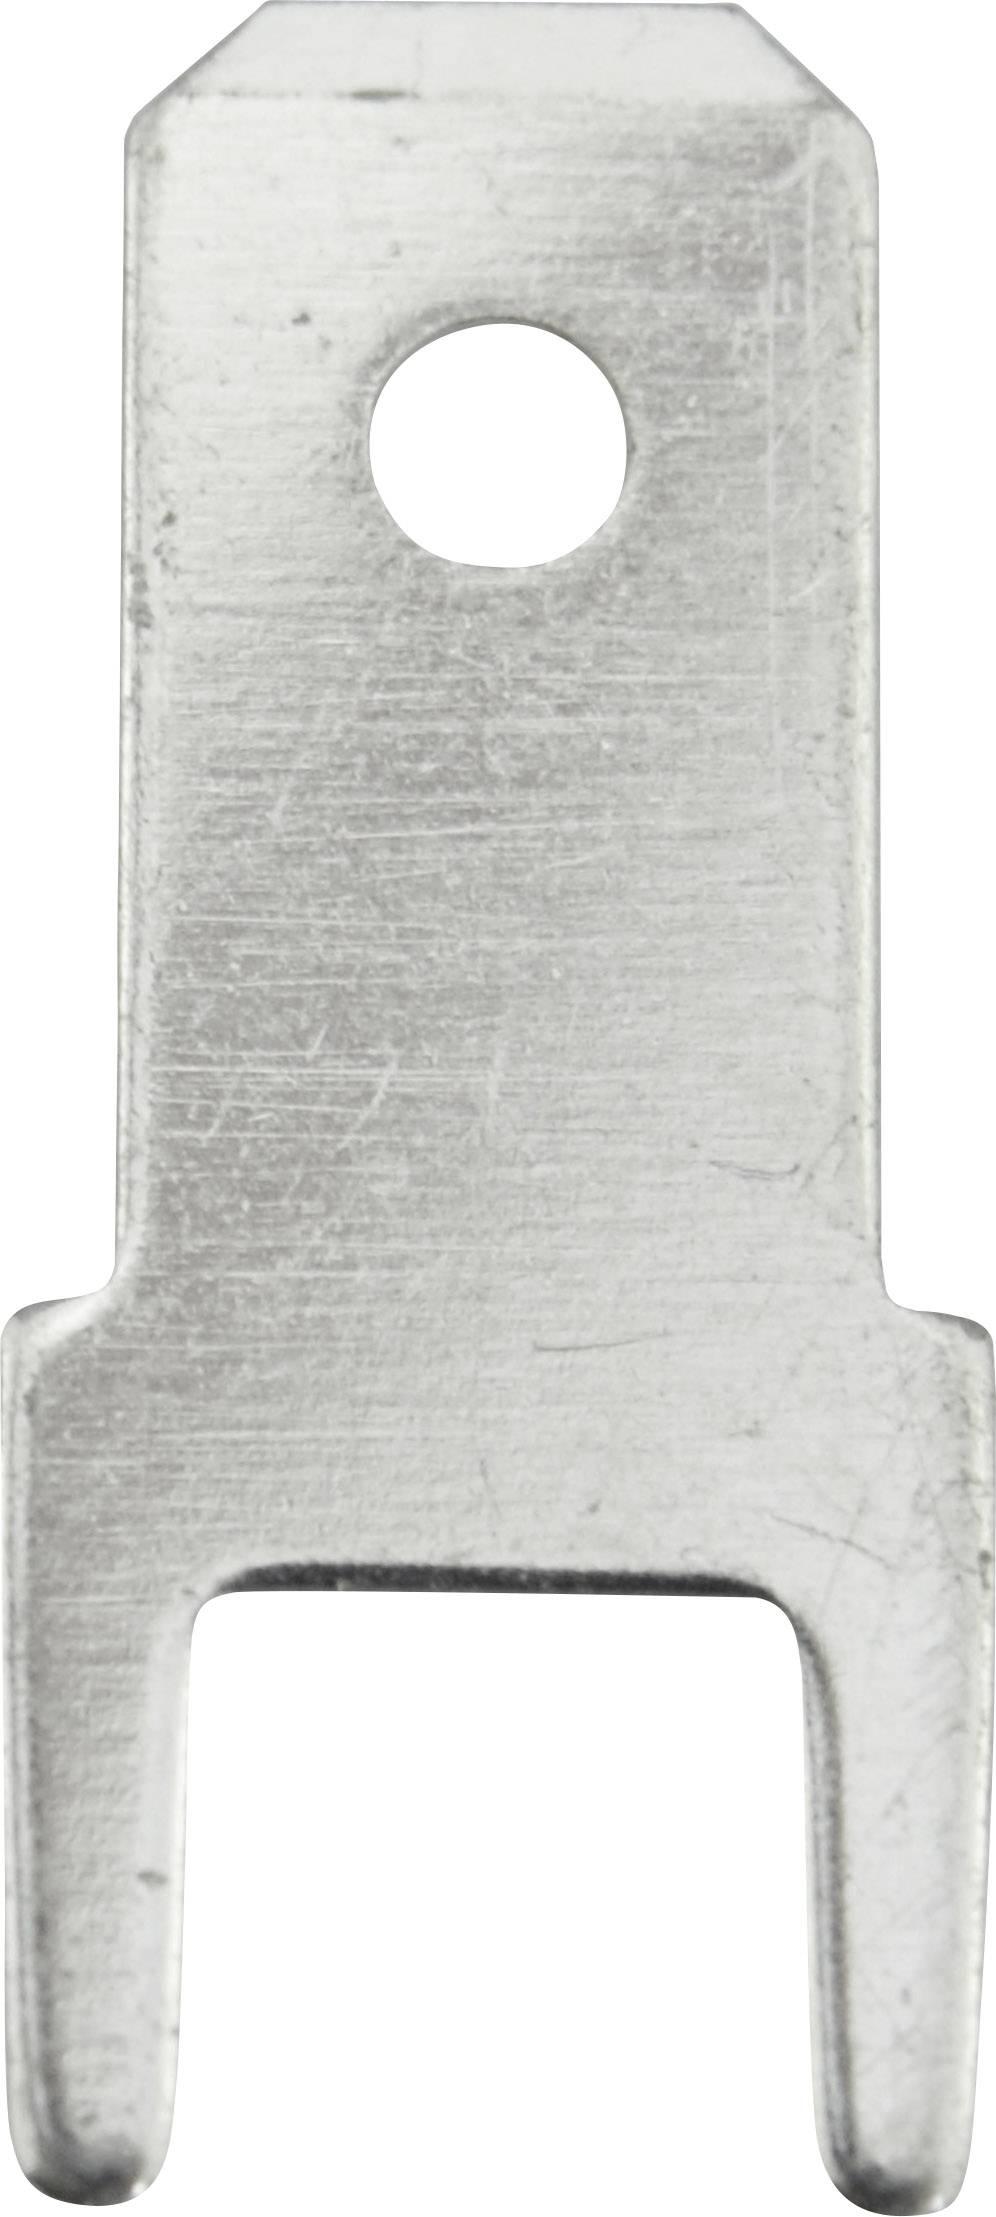 Faston zástrčka Vogt Verbindungstechnik 3825m.68 4.8 mm x 0.8 mm, 180 °, bez izolace, kov, 100 ks